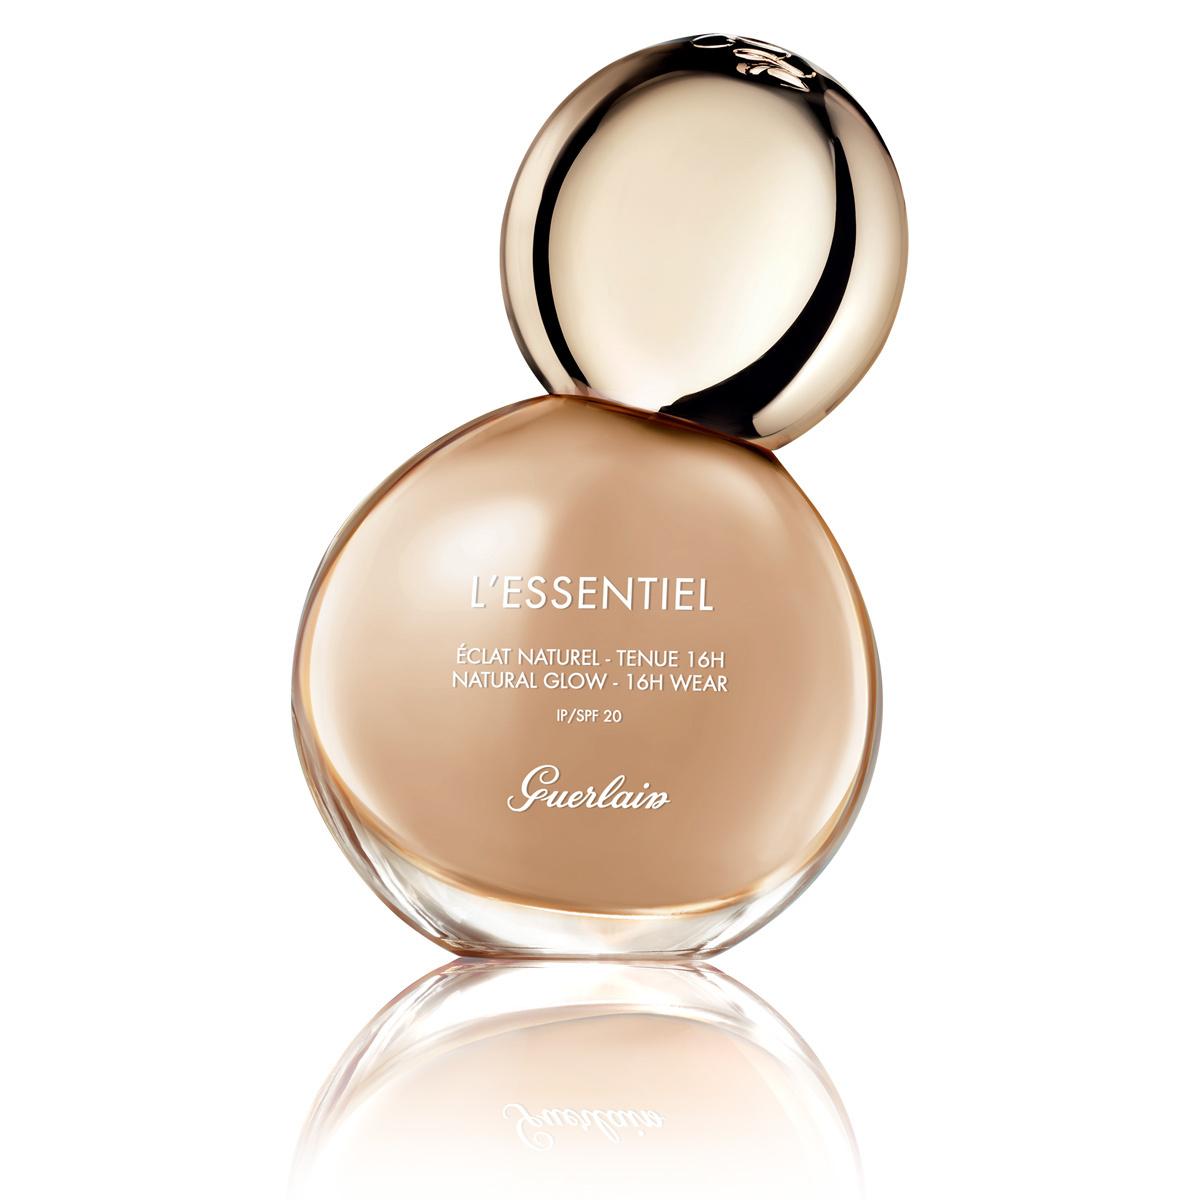 Base de maquillaje L'Essentiel, de Guerlain (55 euros) con un 97 por...